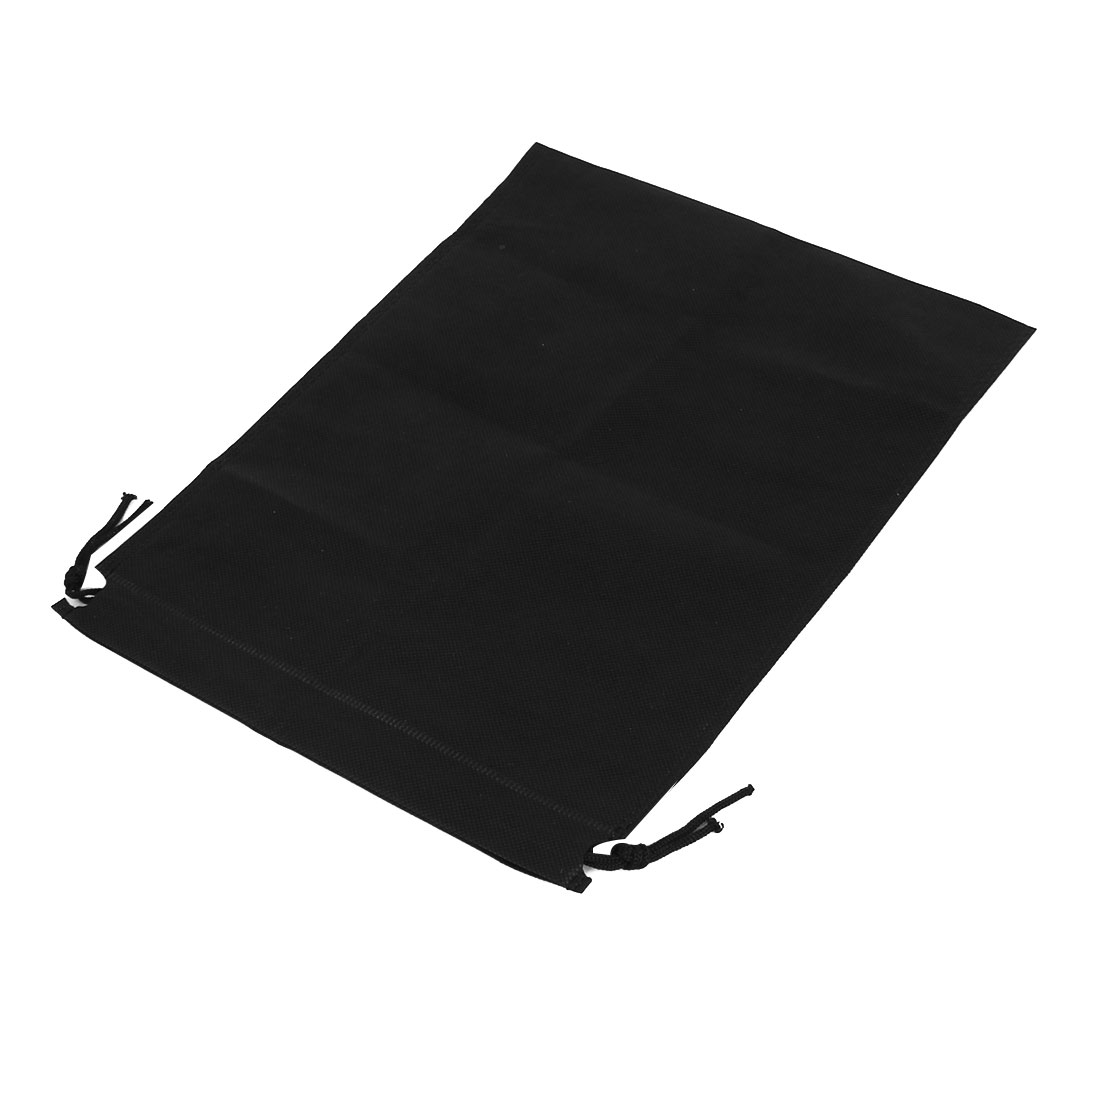 Drawstring Cinch Sack Rectangular Bags Holder 34cm x 25cm Black